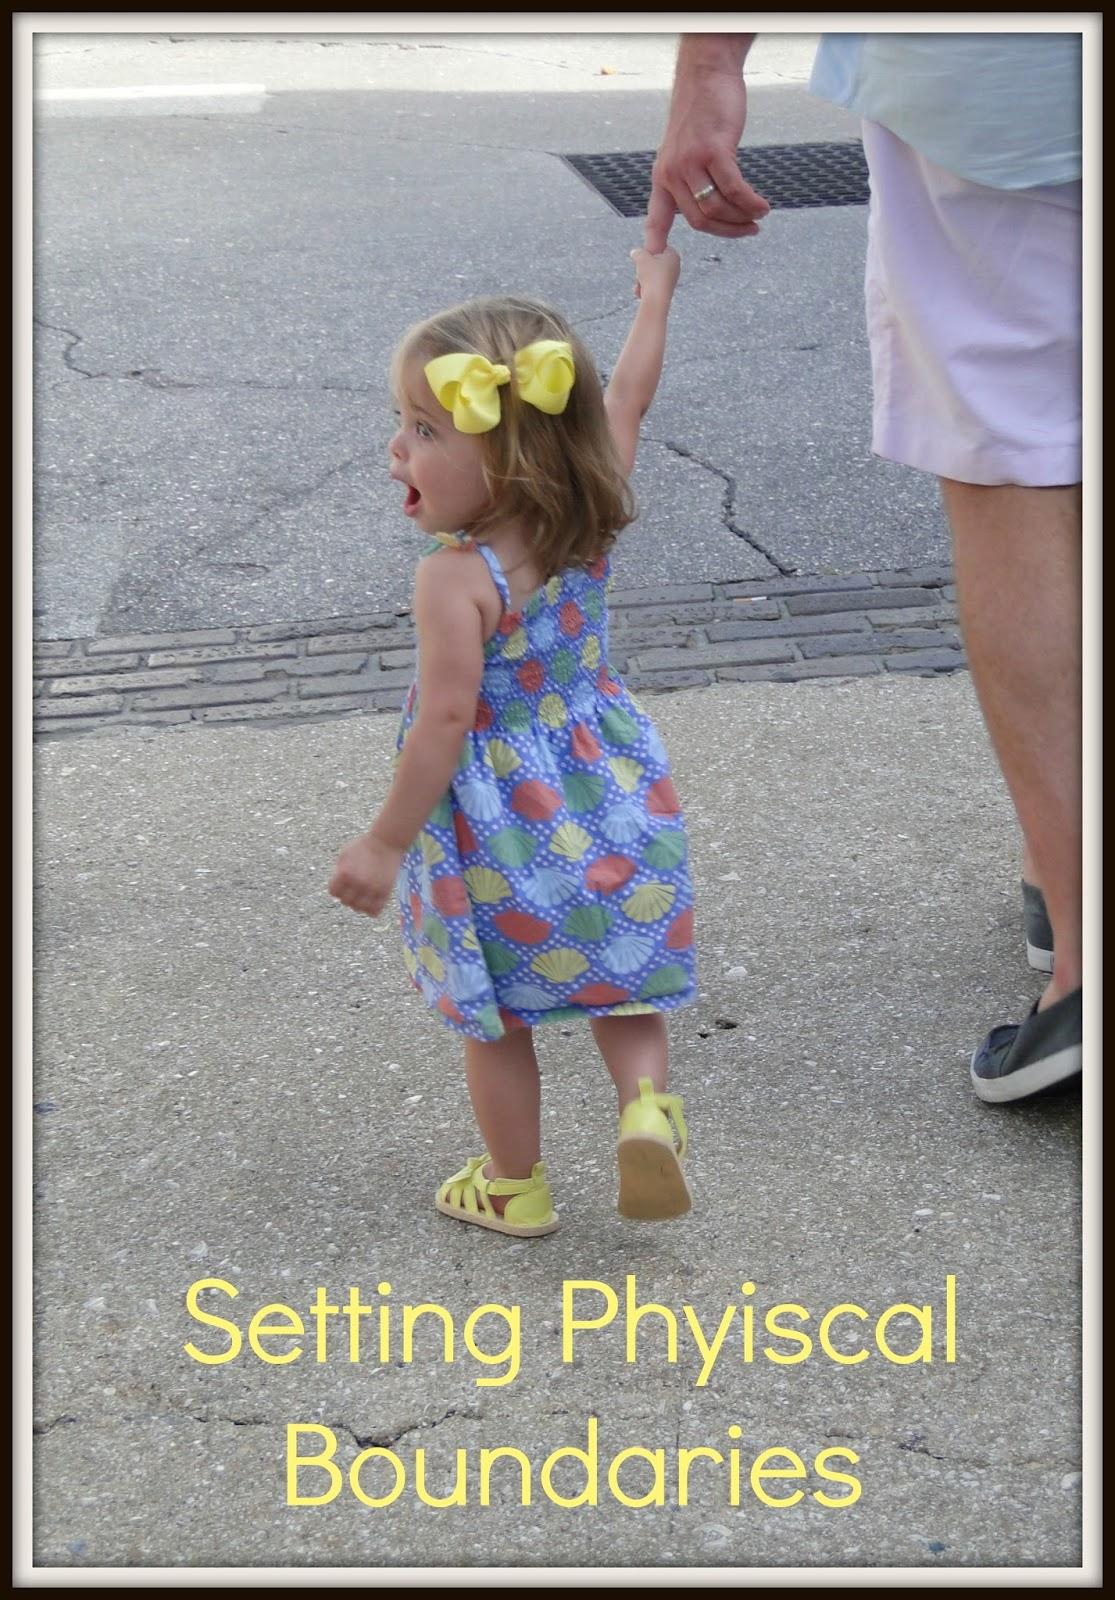 Establishing Physical Boundaries